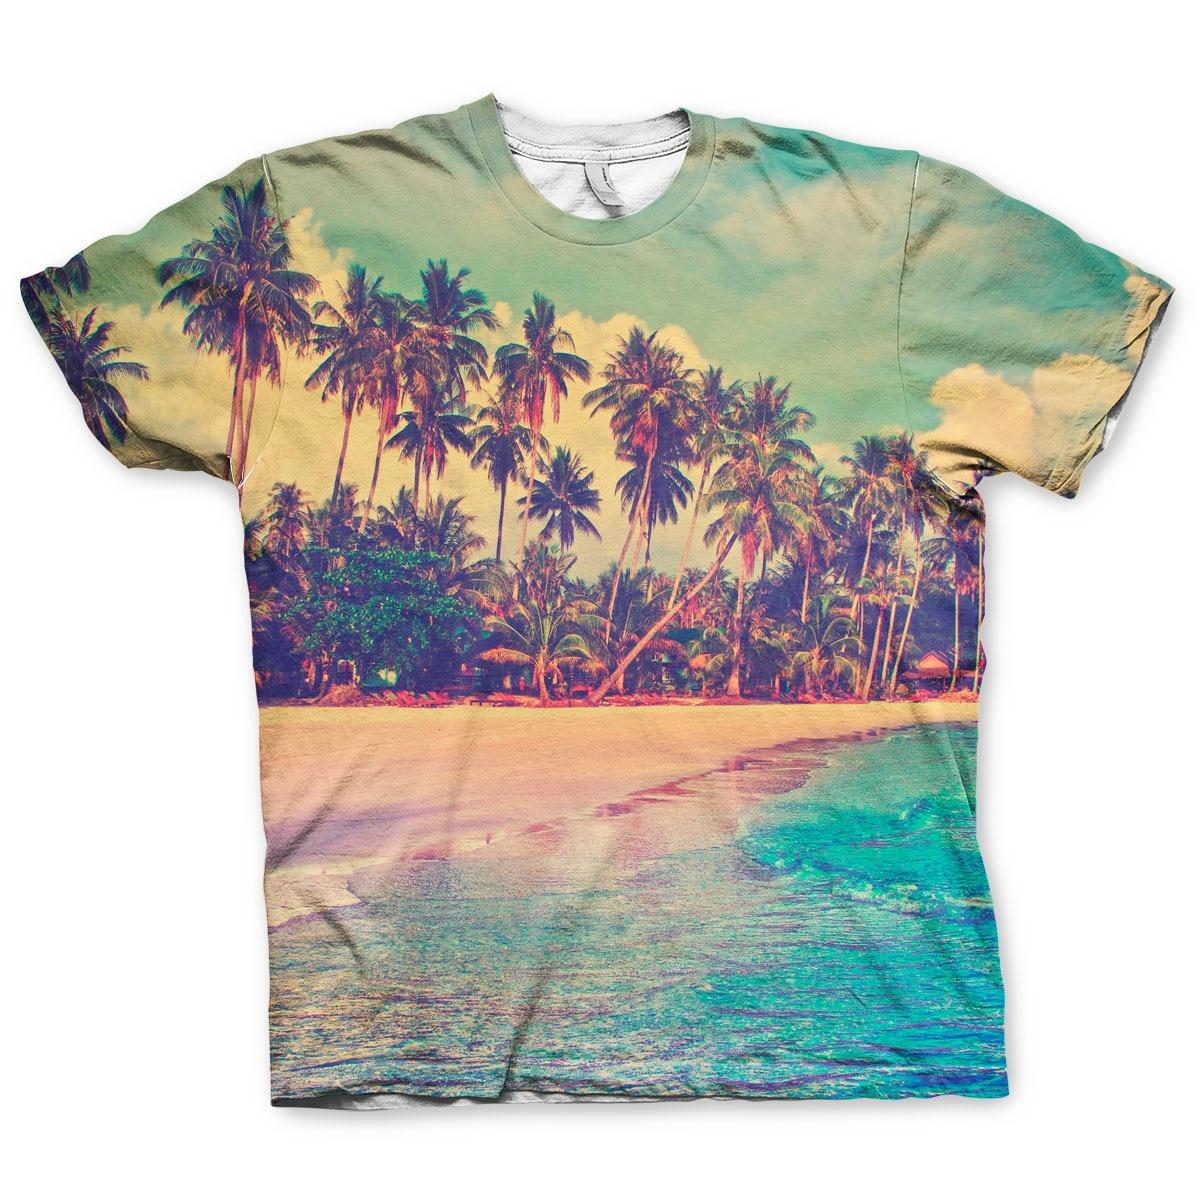 Tropical Allover T-Shirt